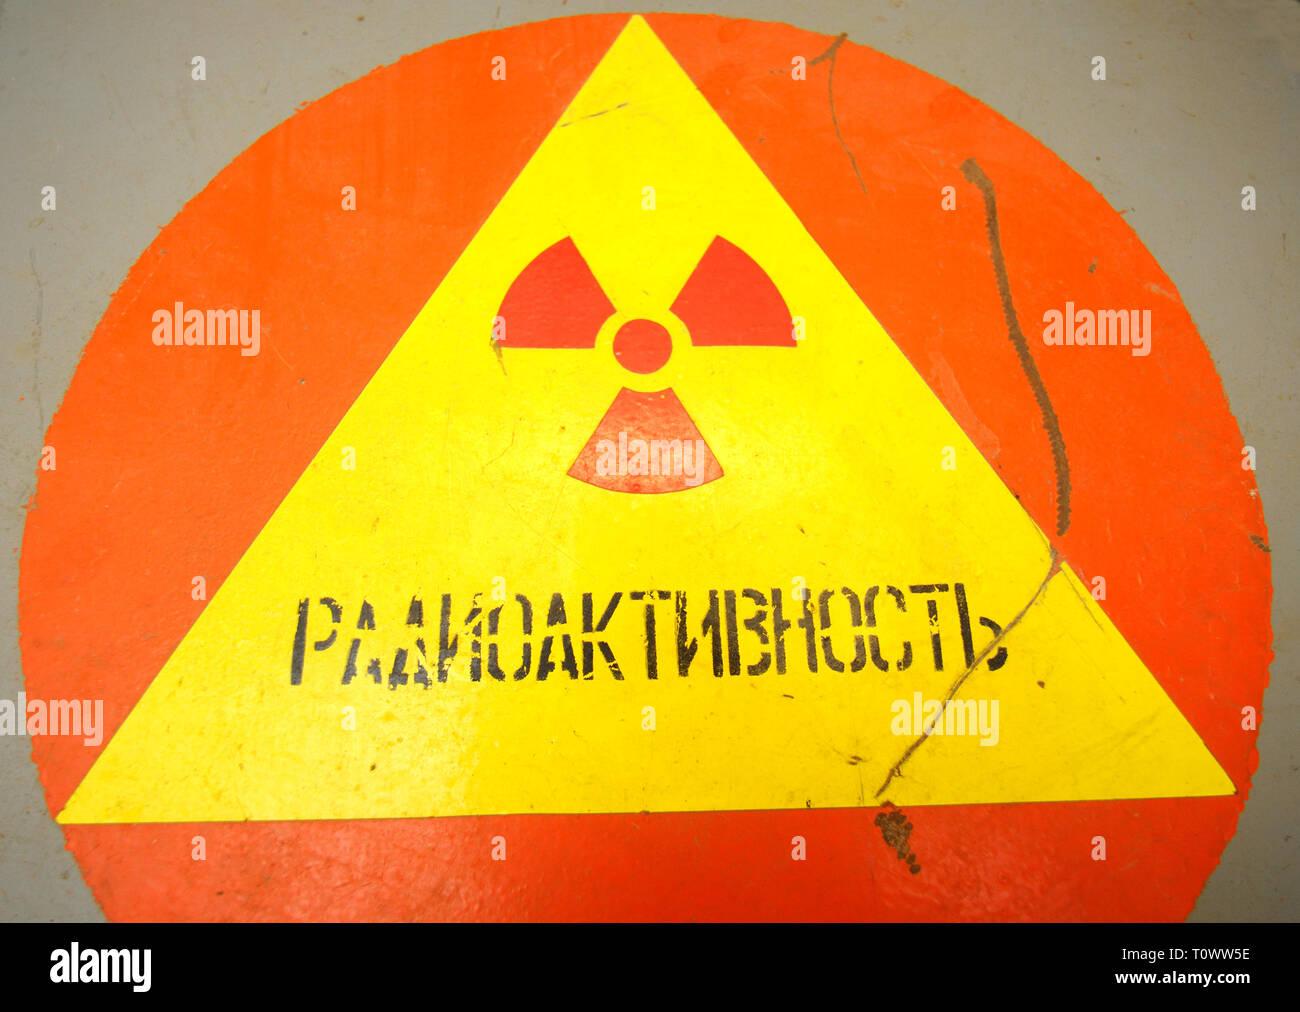 Radiation hazard sign - Stock Image